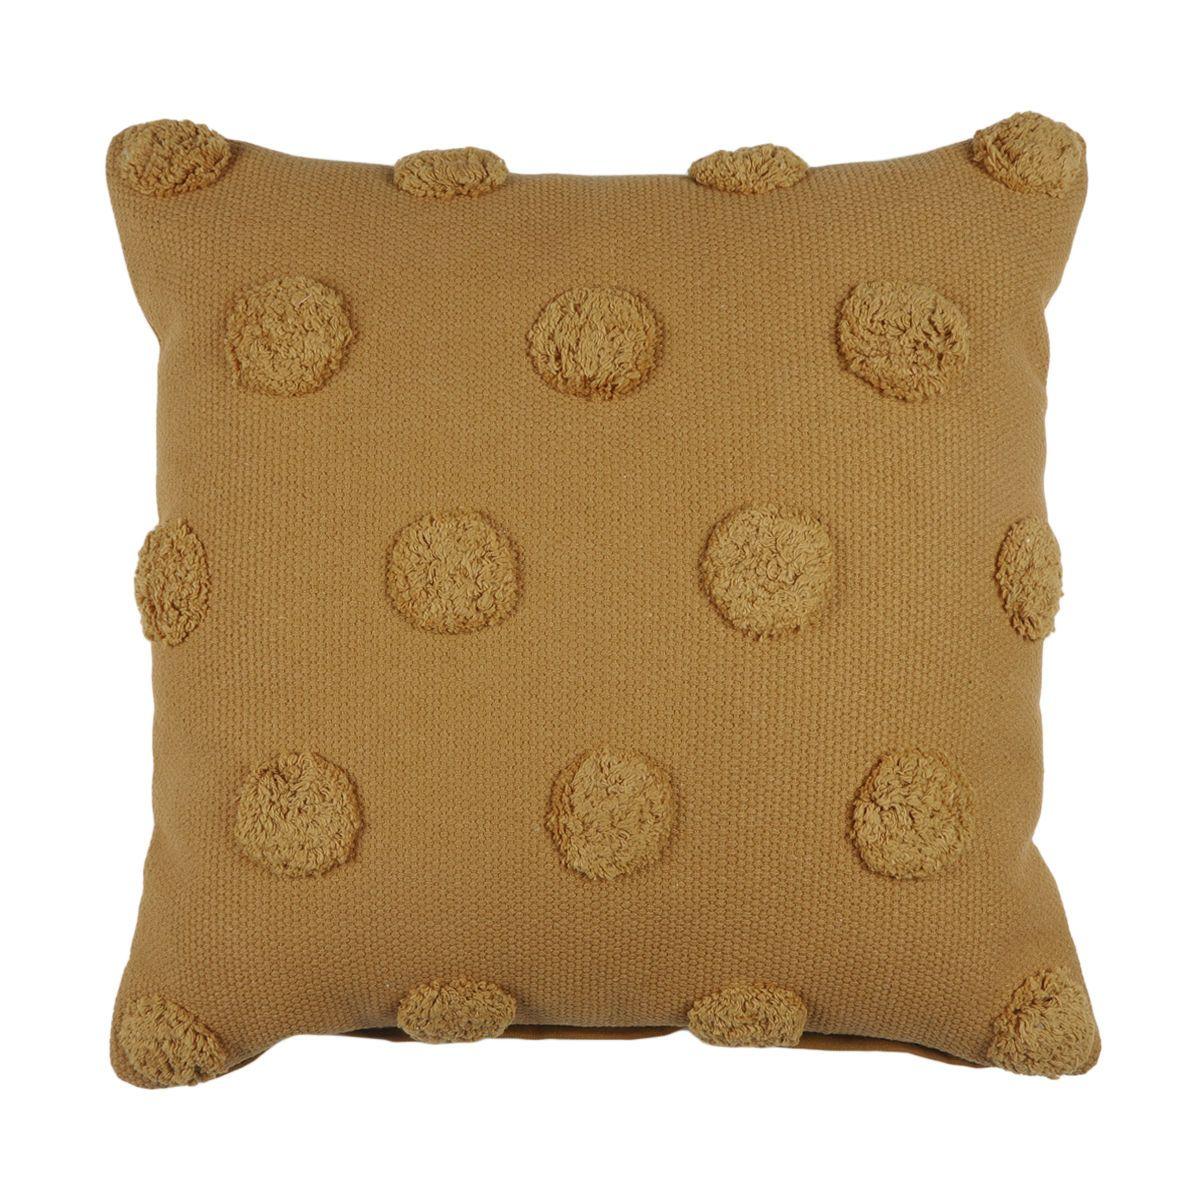 Issa Cushion Mustard Mustard cushions, Kmart home